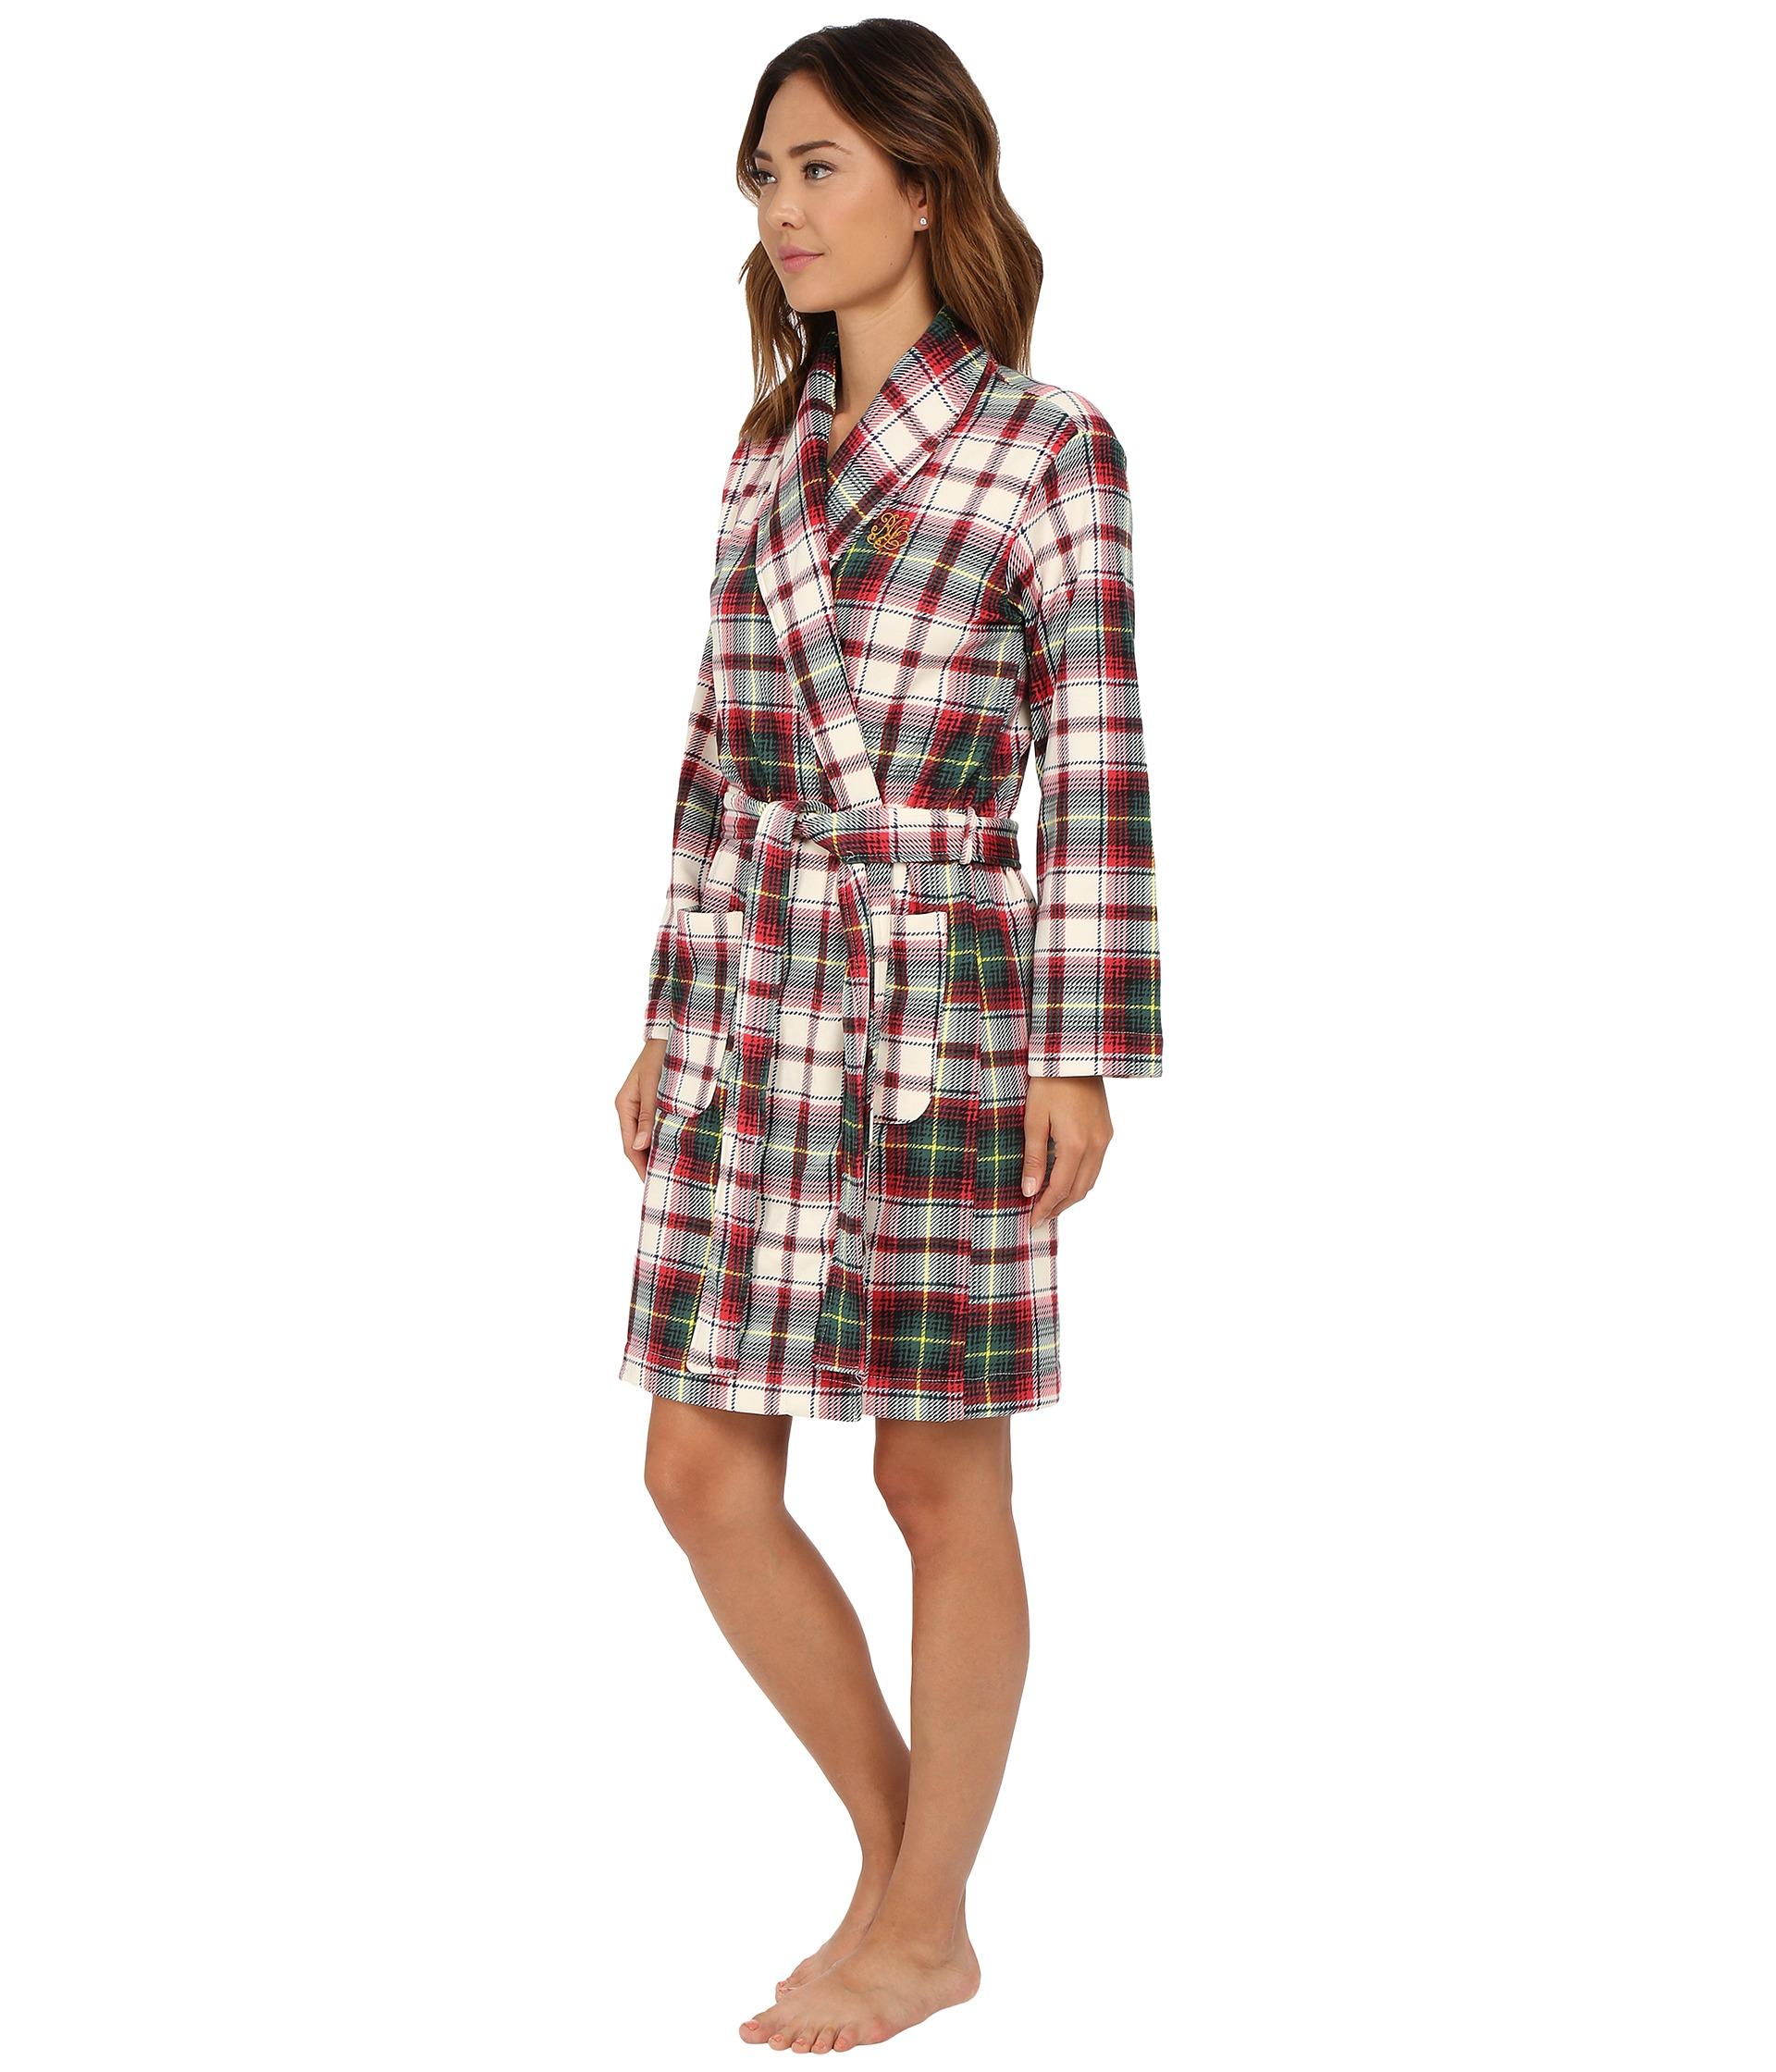 lauren by ralph lauren folded beaufort fleece short robe free shipping both ways. Black Bedroom Furniture Sets. Home Design Ideas